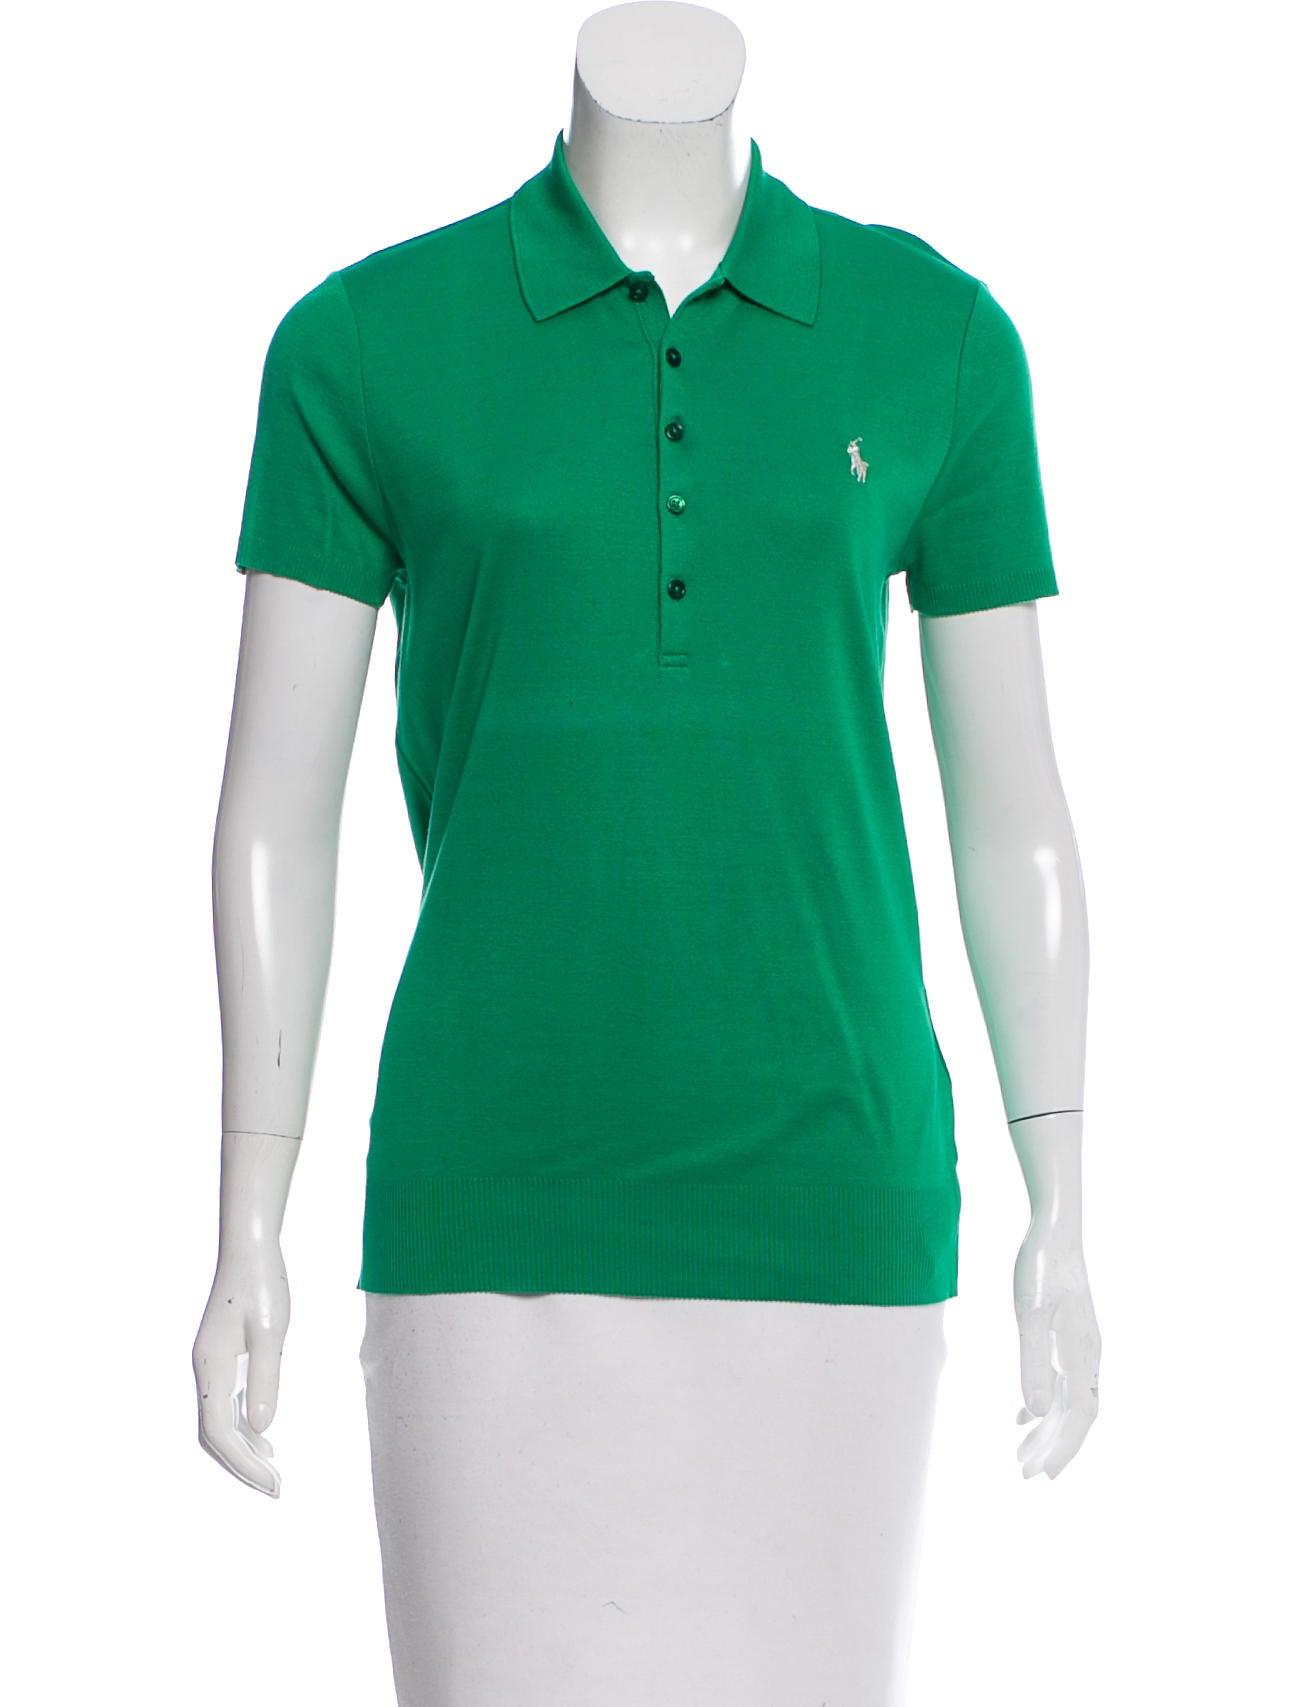 Ralph lauren black label embroidered short sleeve polo for Ralph lauren black label polo shirt